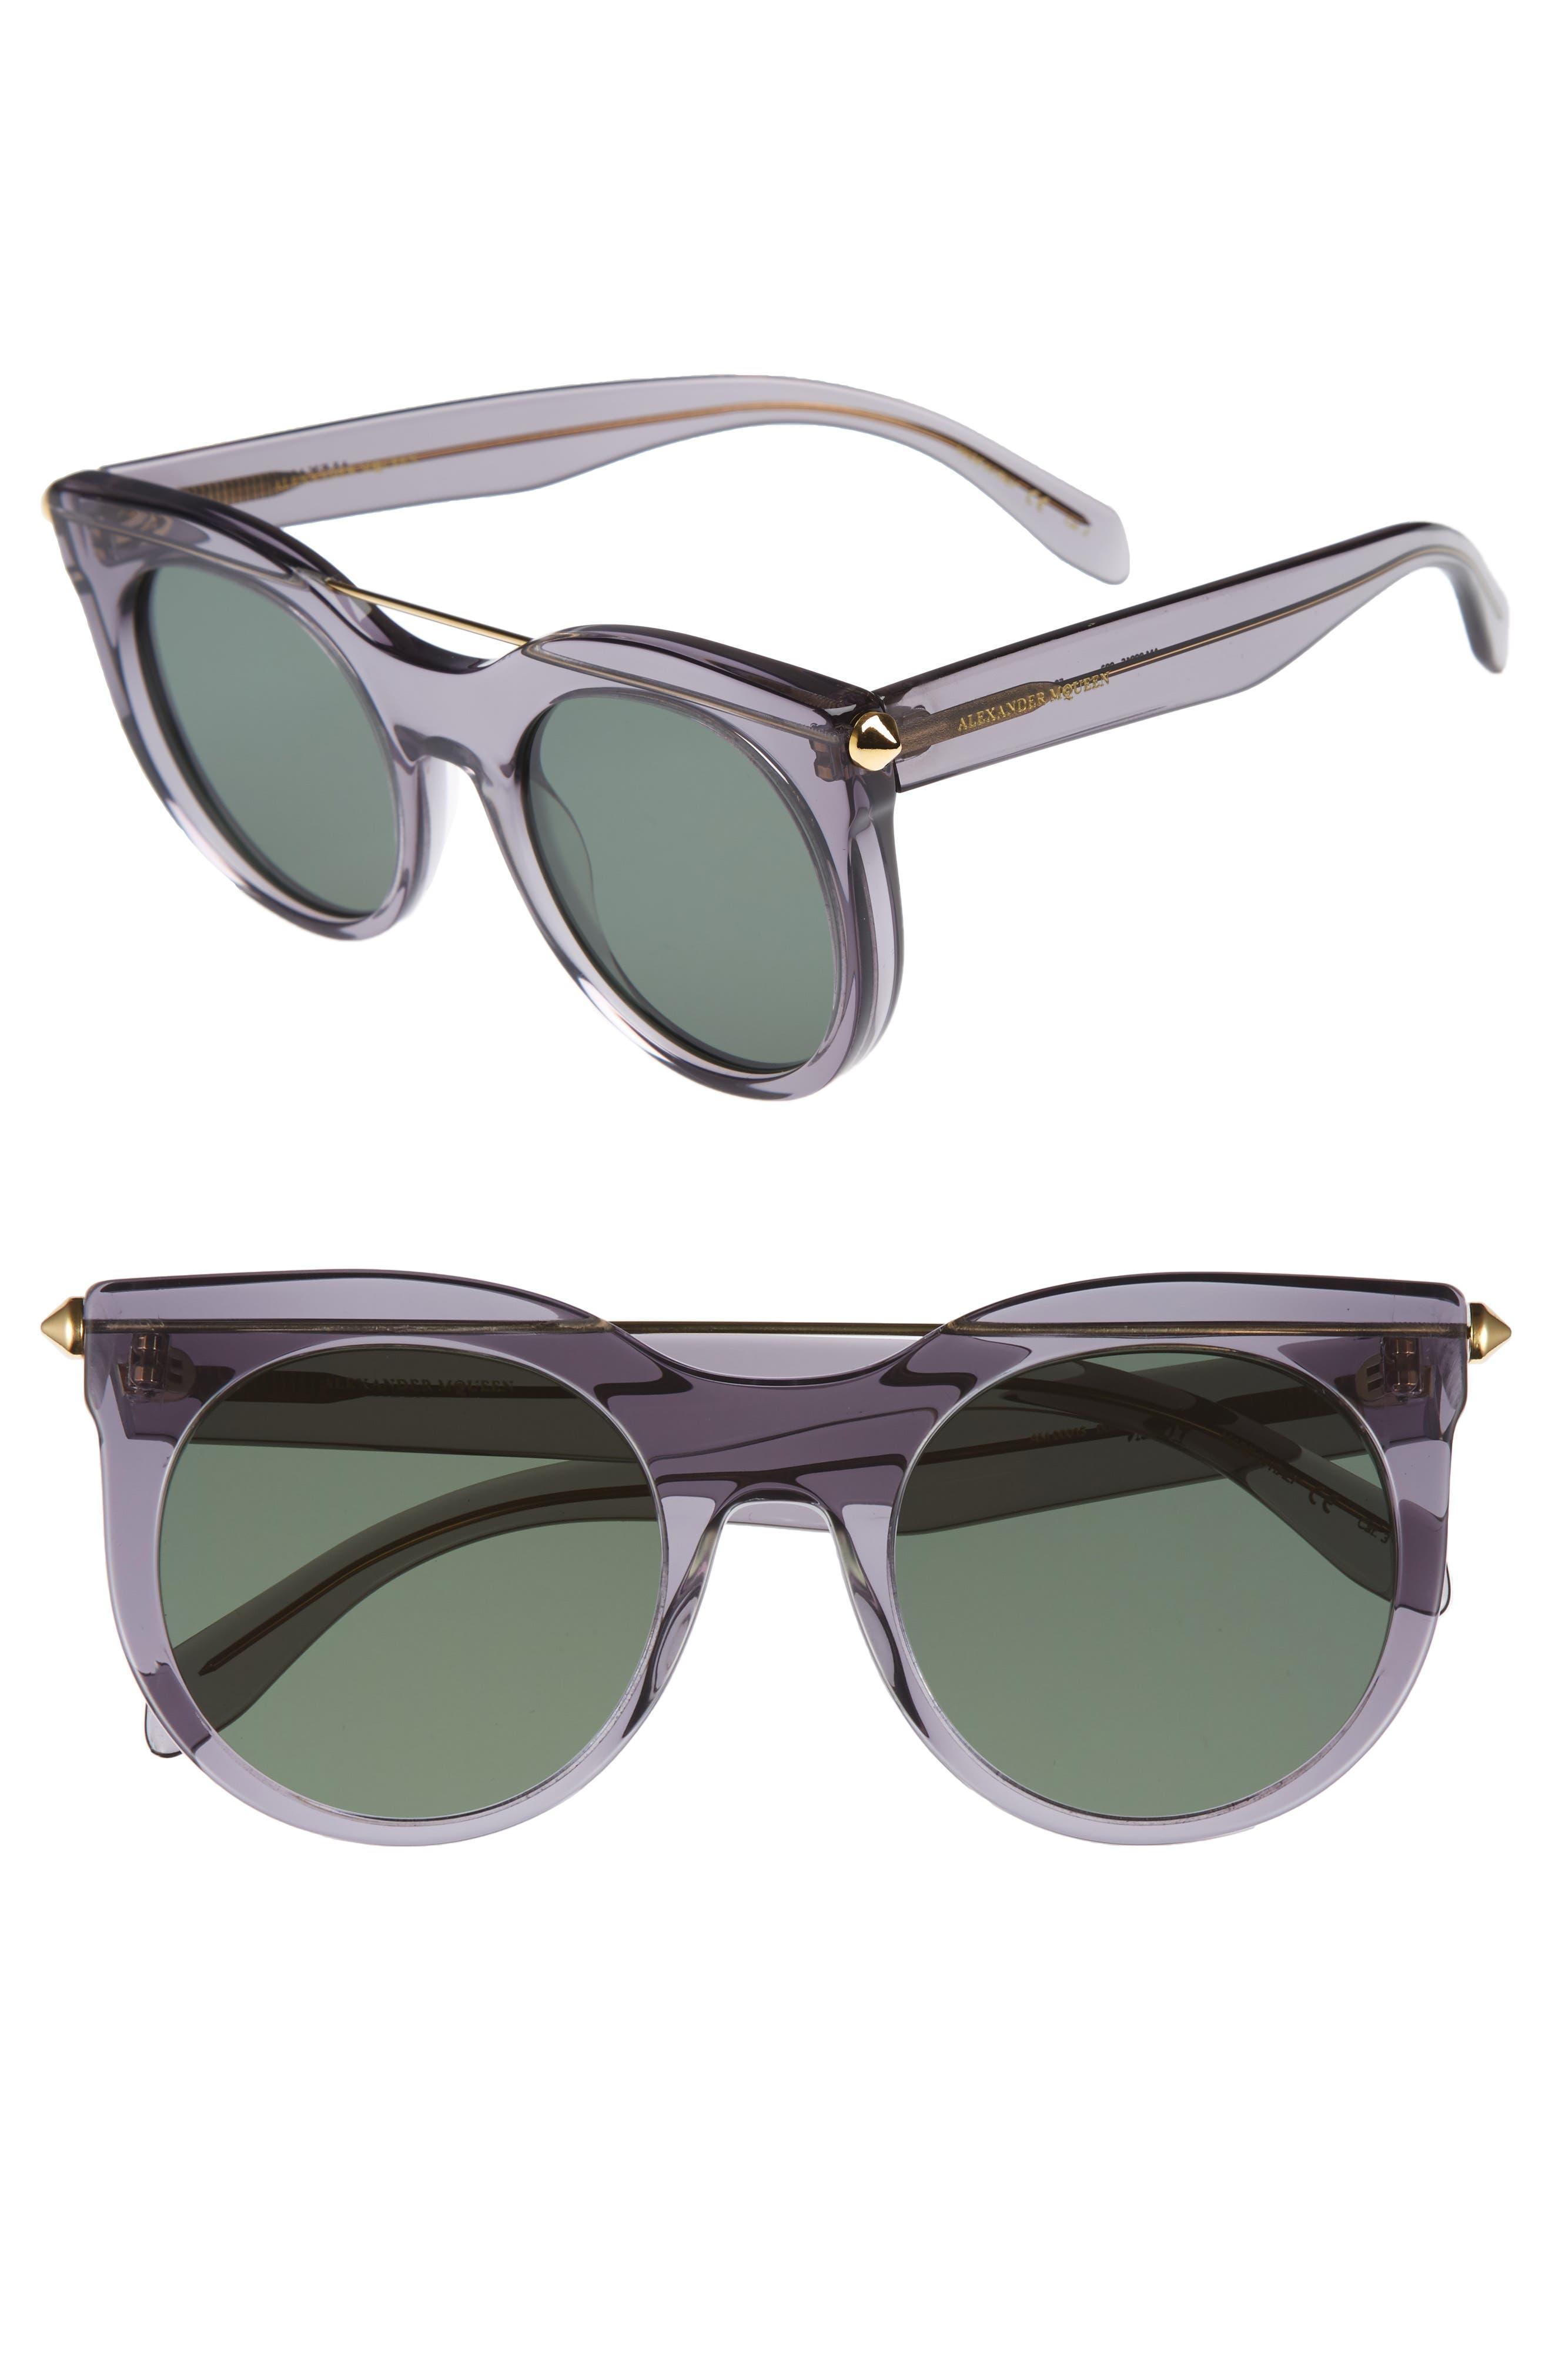 52mm Cat Eye Sunglasses,                             Main thumbnail 1, color,                             Grey